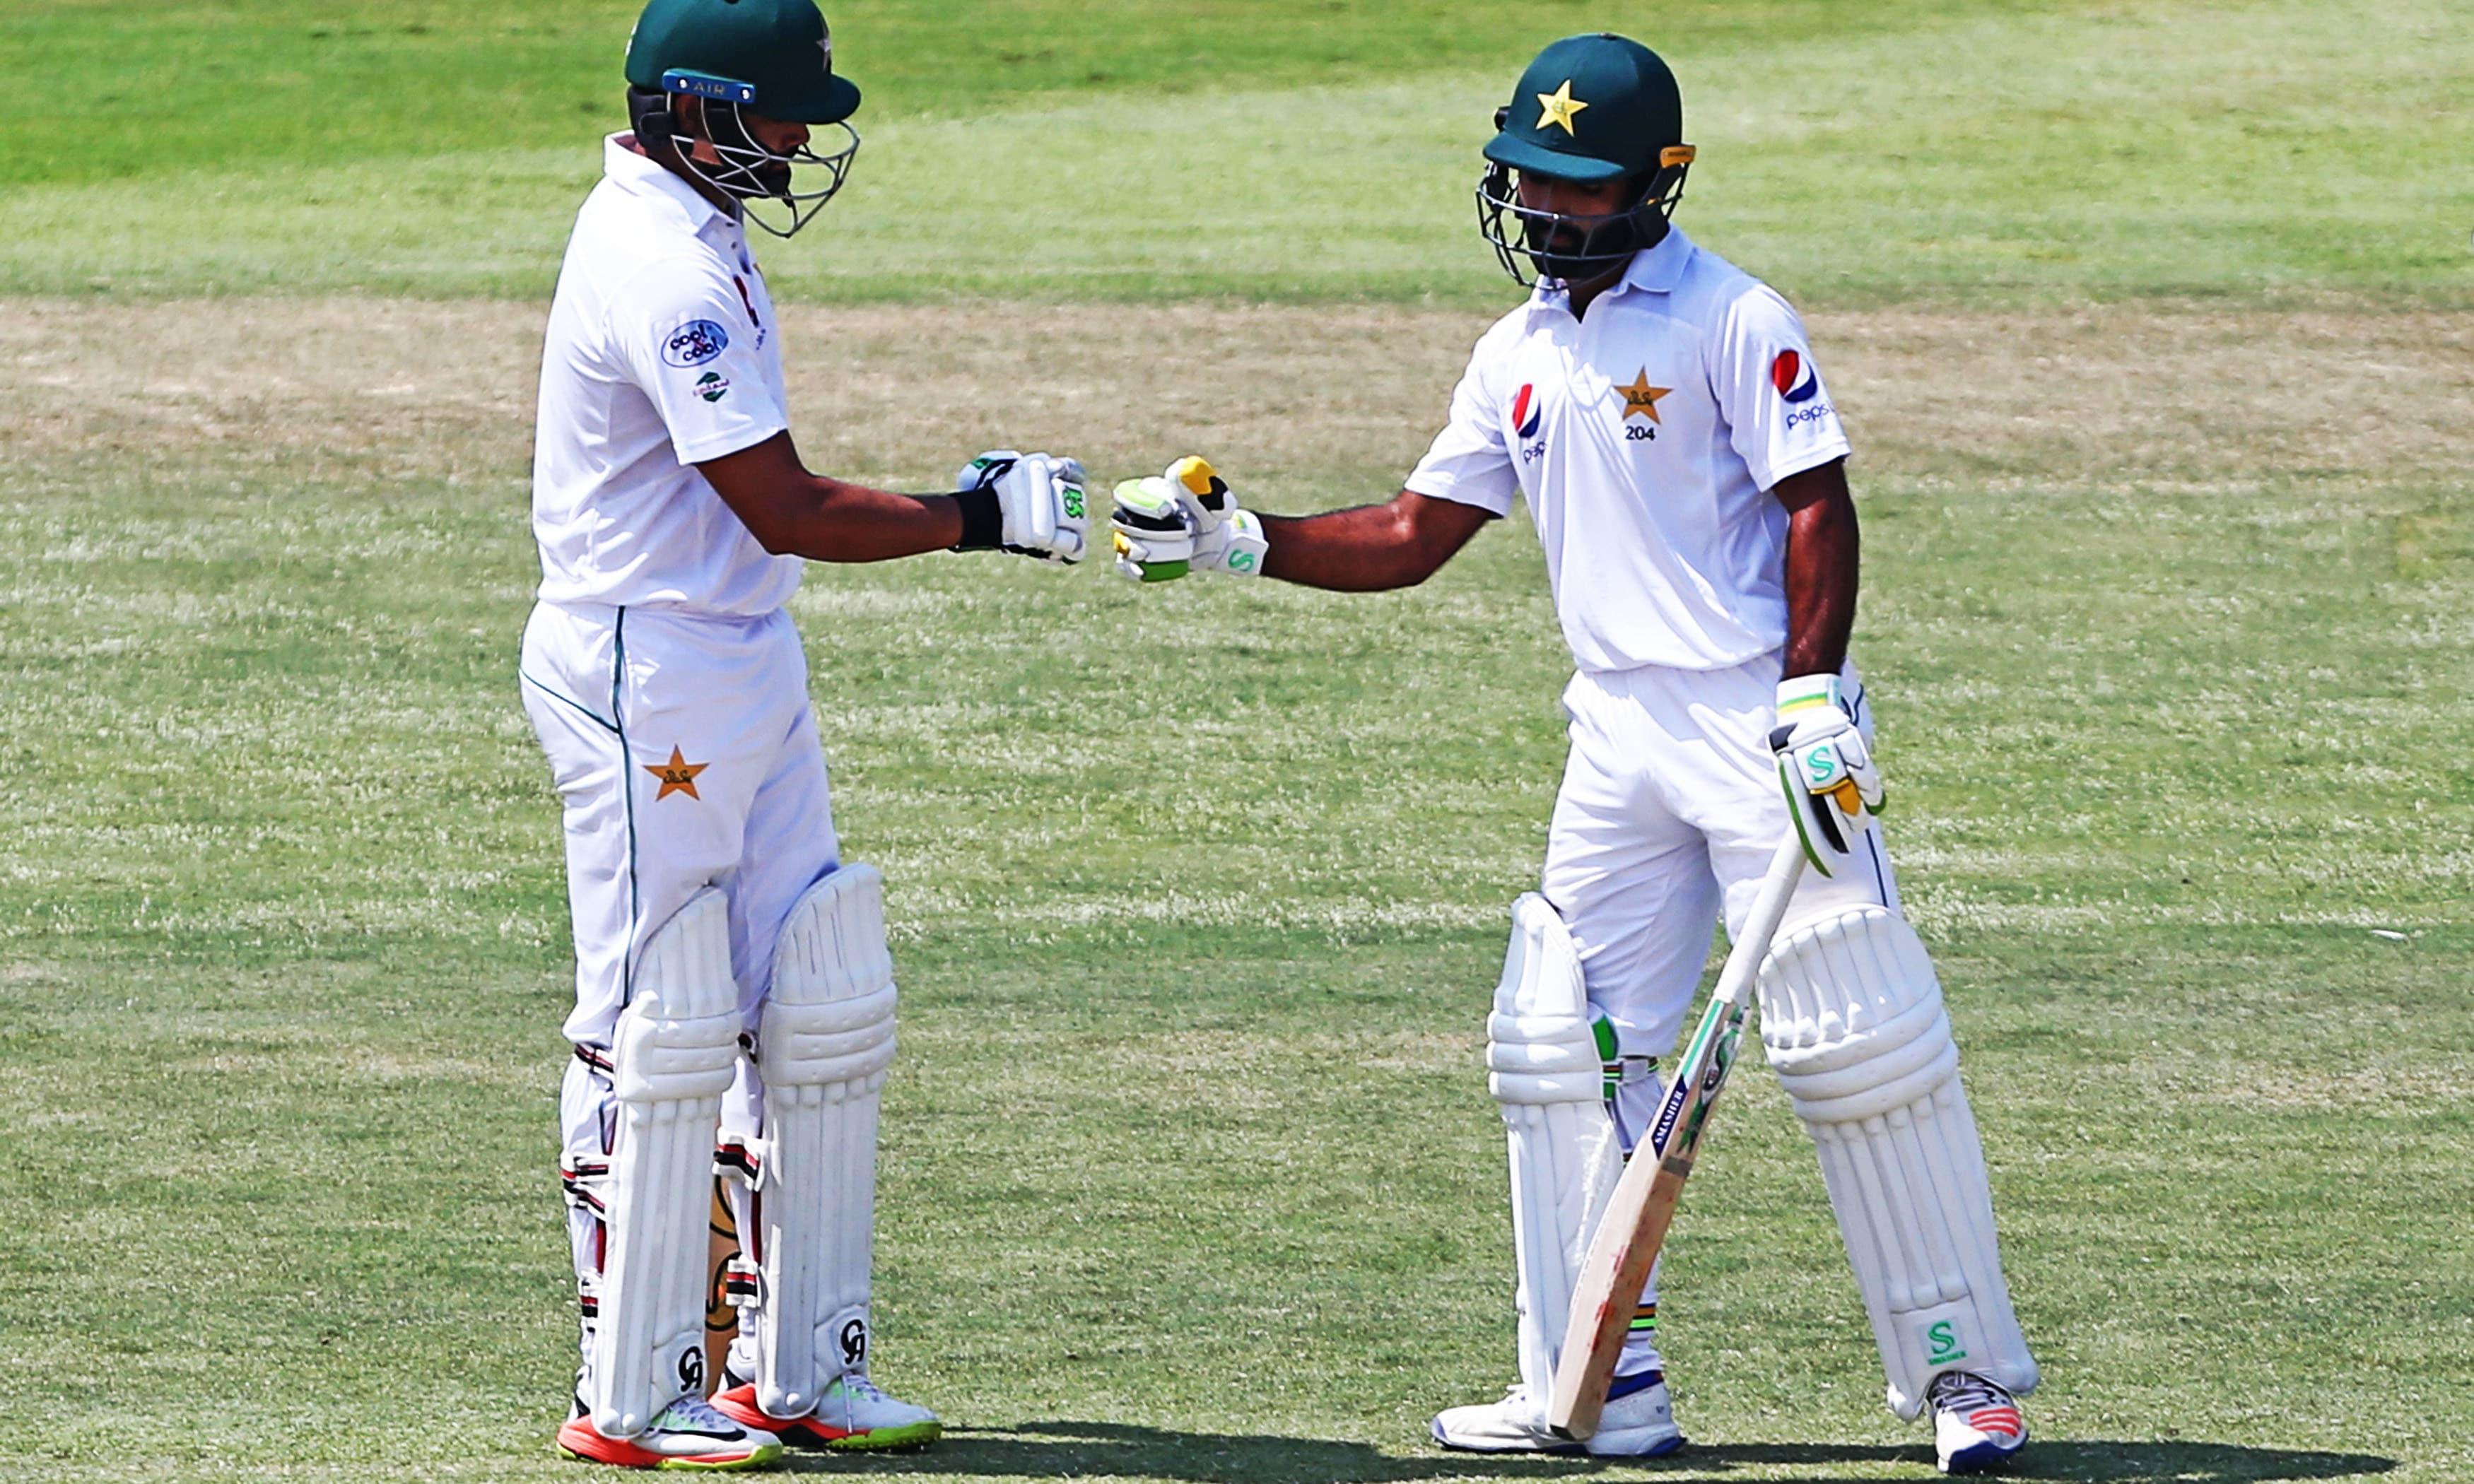 Azhar Ali joins Pakistan's '5,000 Test runs' club